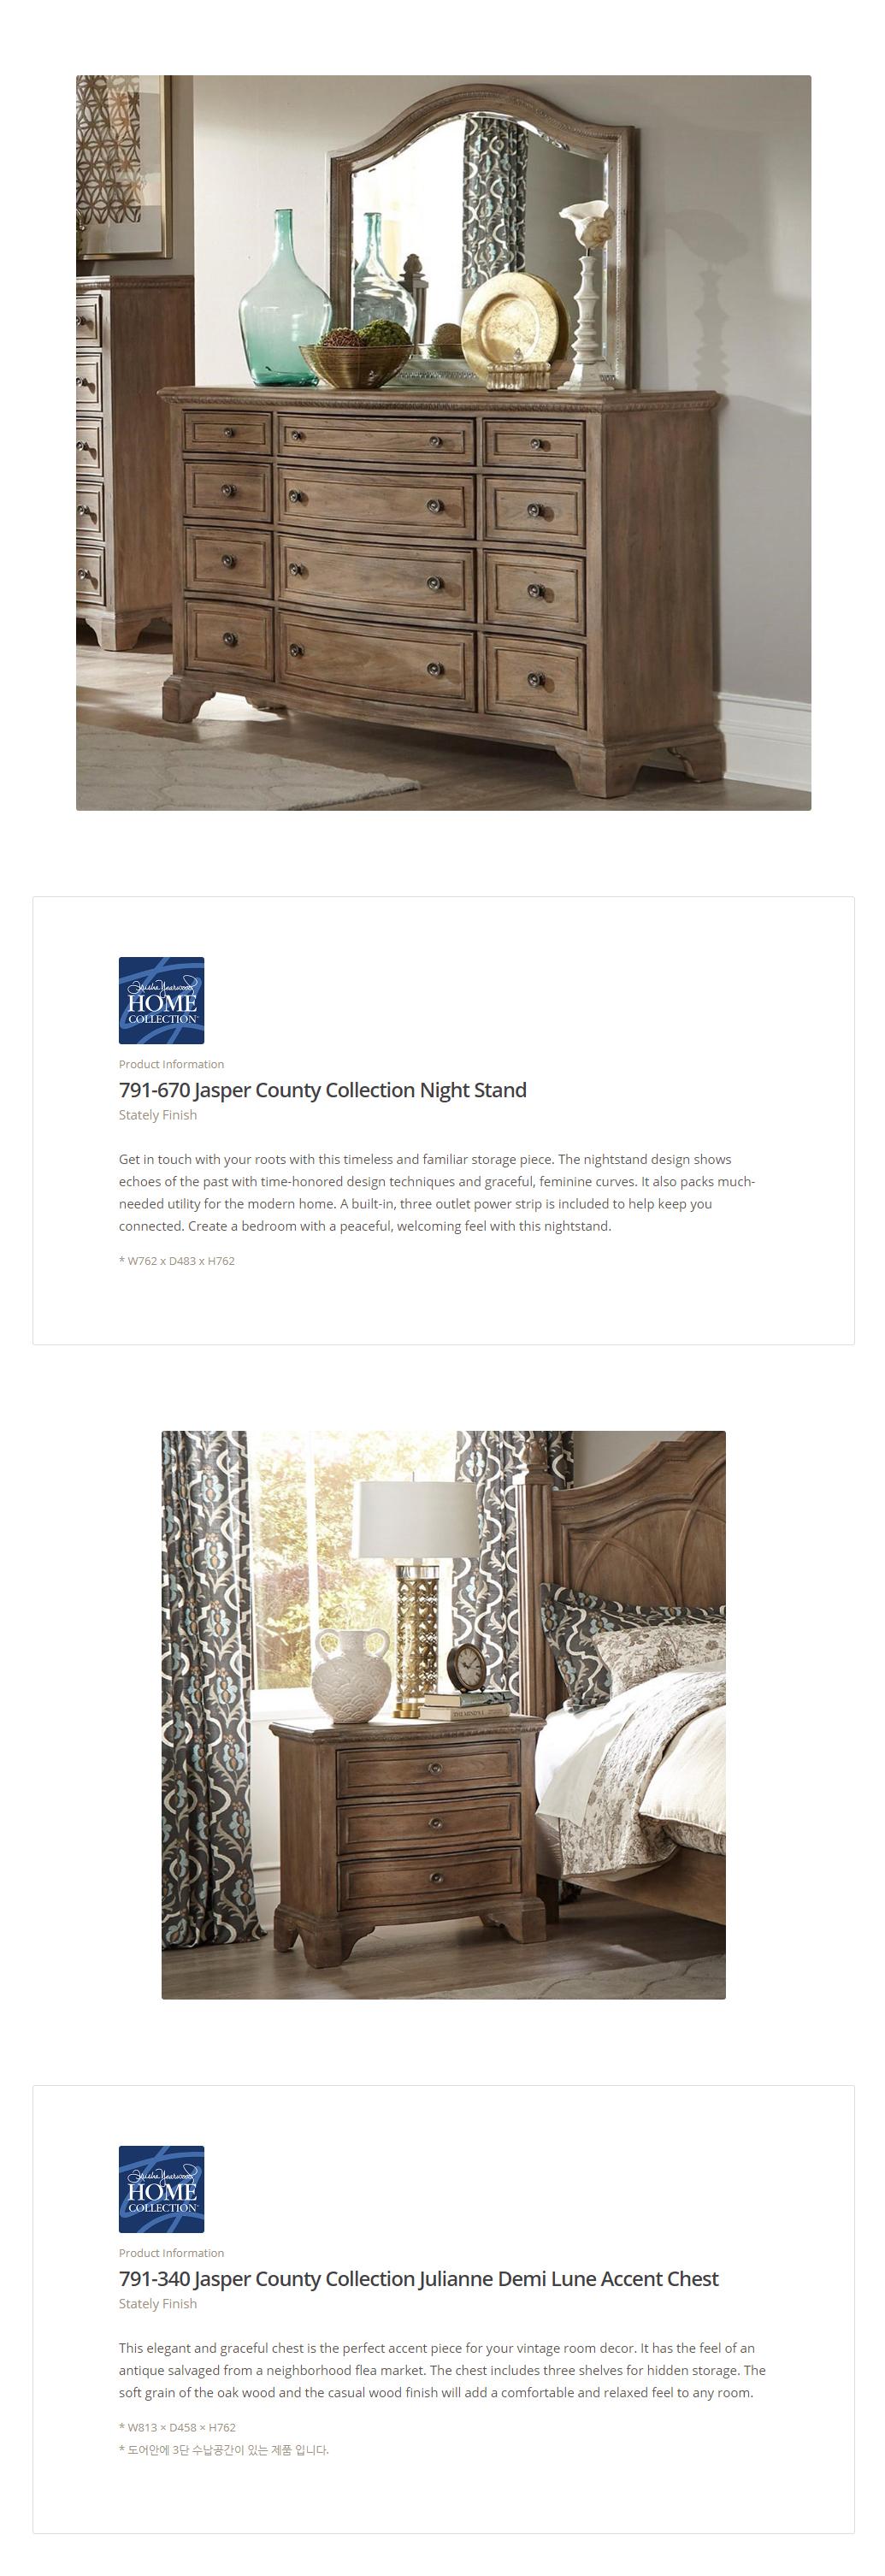 791_Jasper_County_bedroom_03.jpg